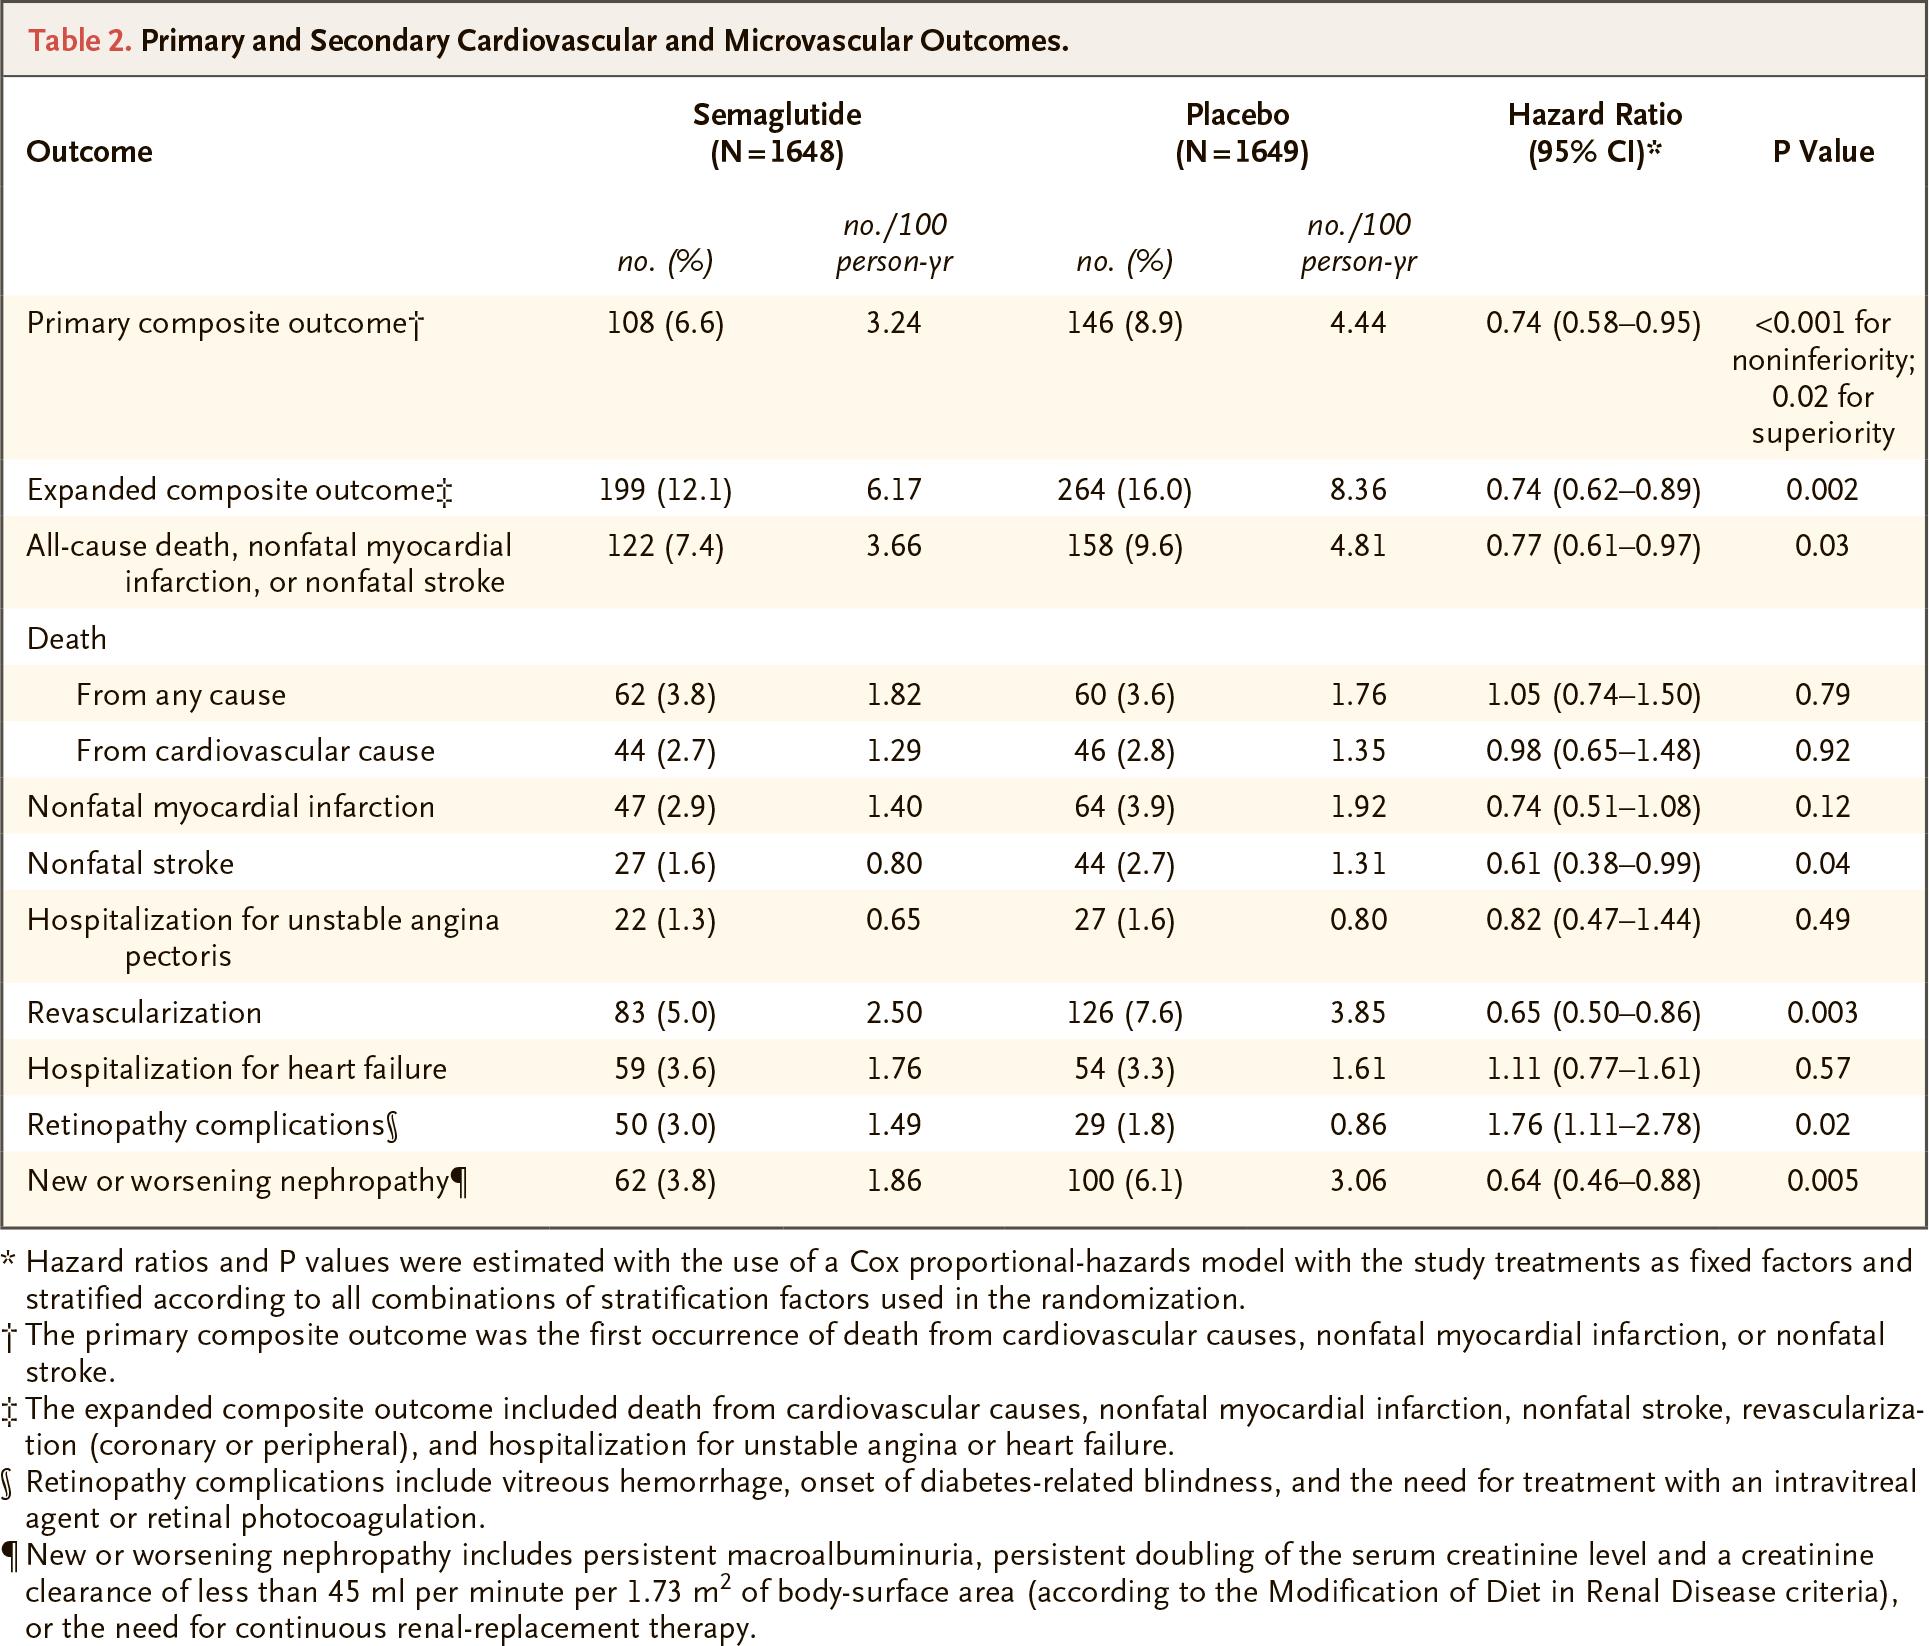 nct01720446 results 01 - Семаглутид спасет сердце диабетиков